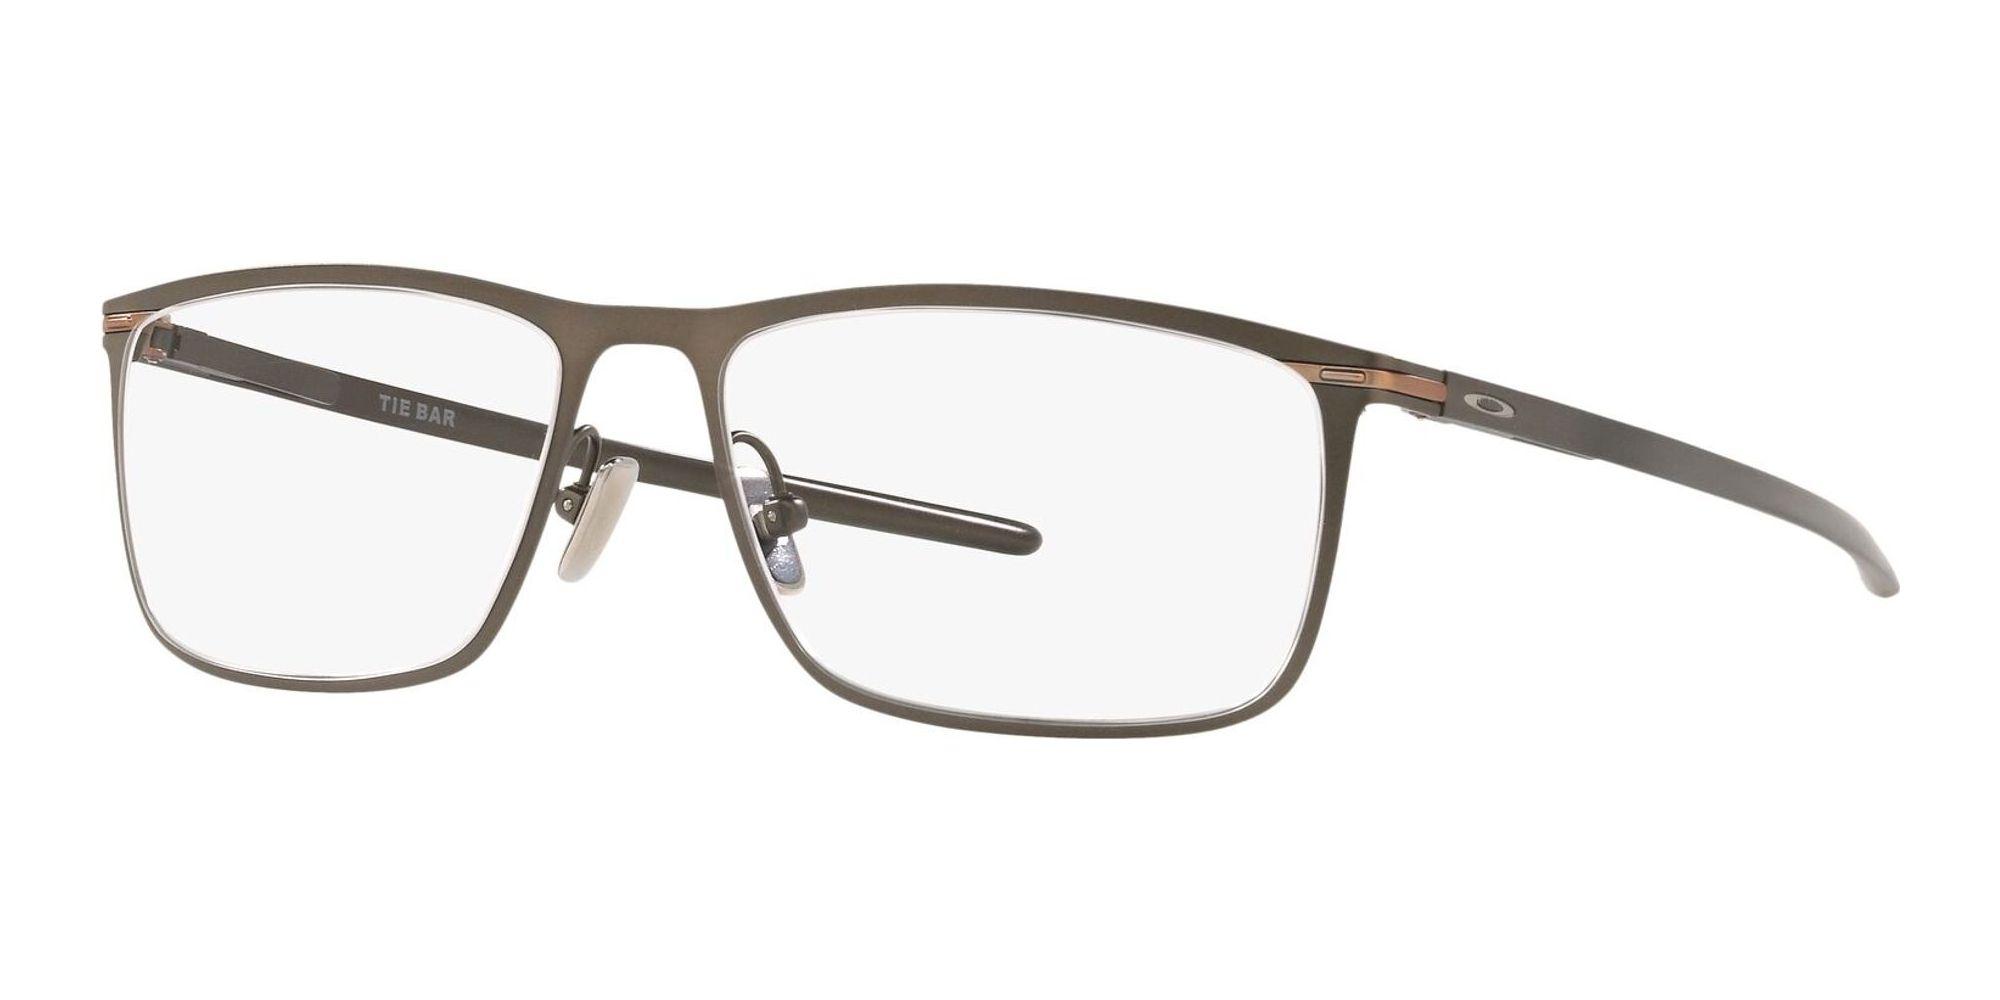 Oakley briller TIE BAR OX 5138